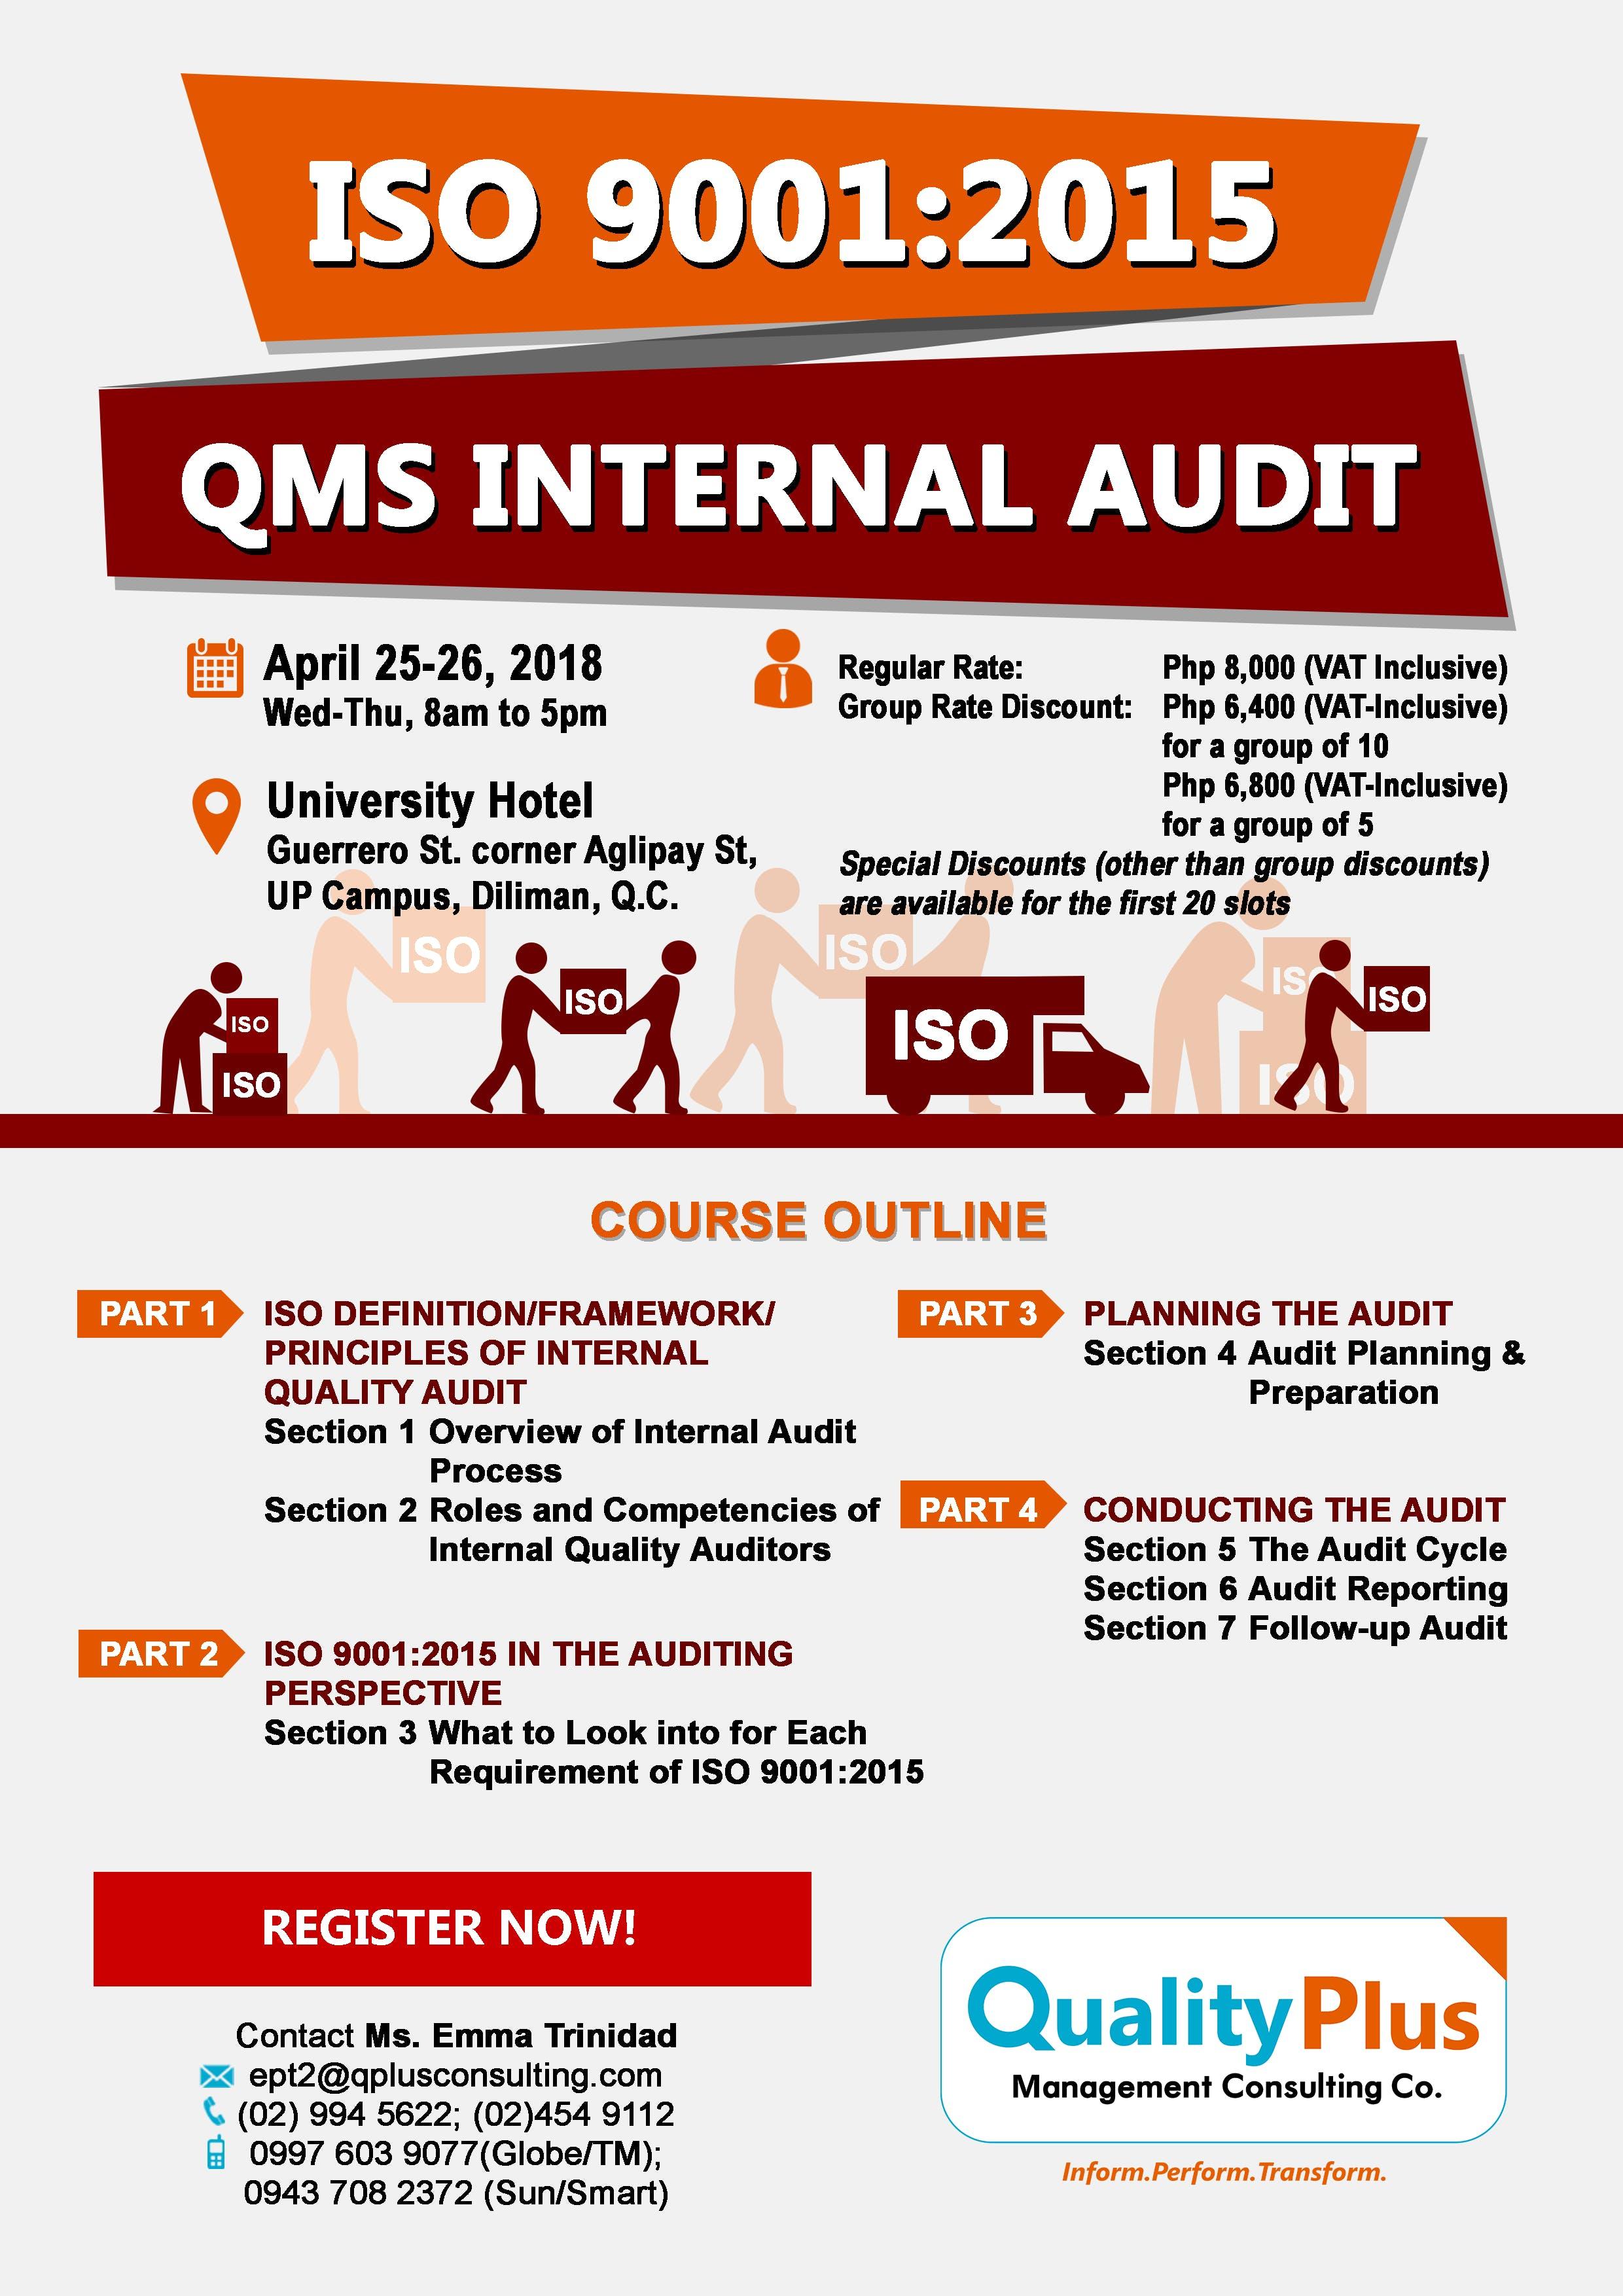 iso 9001:2015 qms internal audit at the university hotel, quezon city